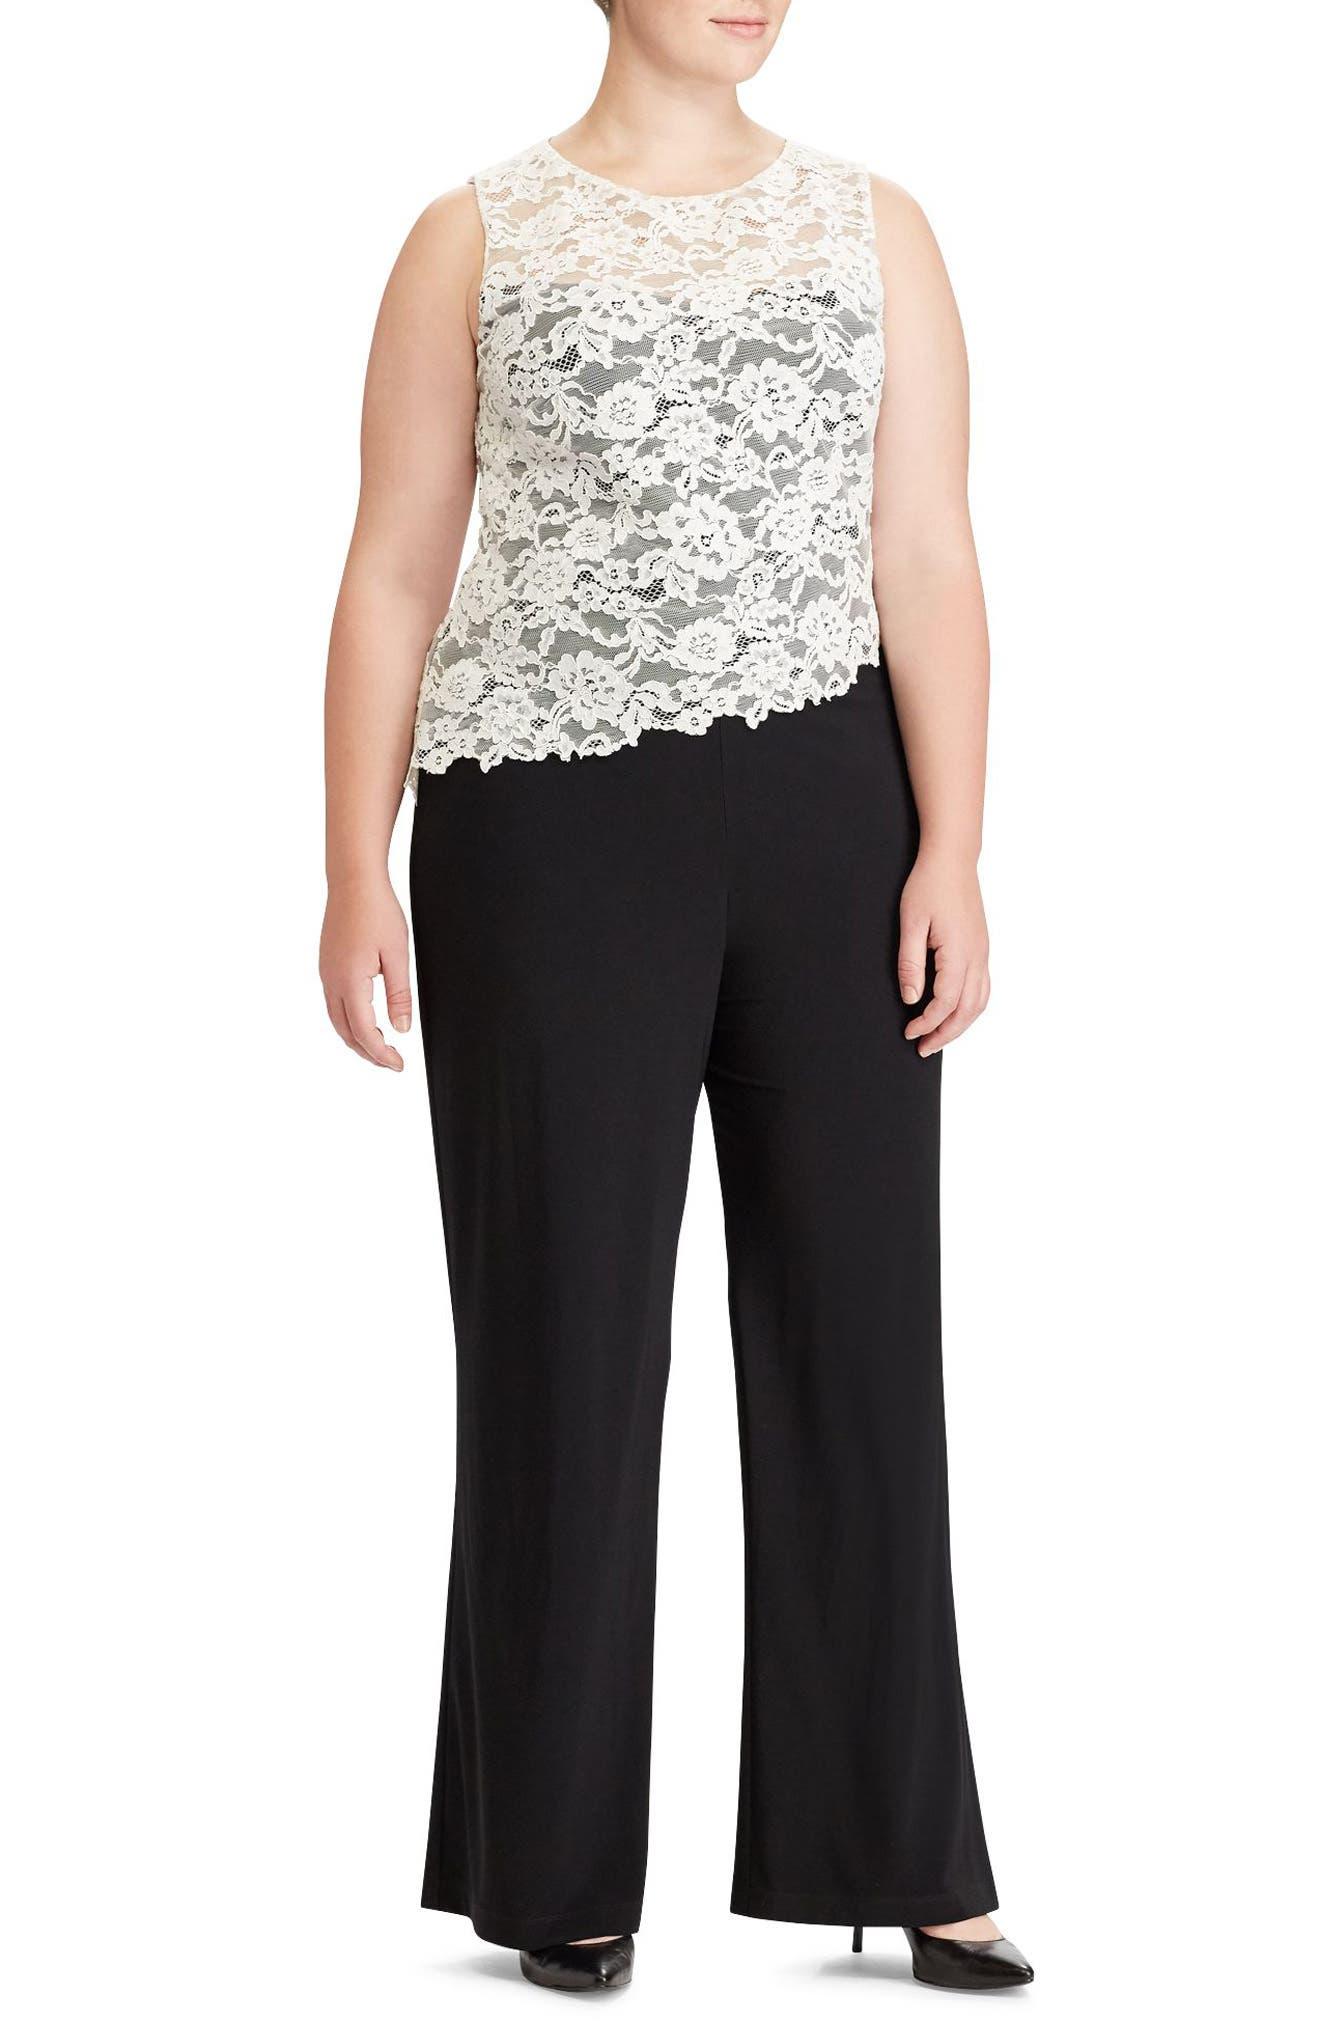 Zakiya Lacy Jumpsuit,                         Main,                         color, Black/ Lauren White/ Wheat